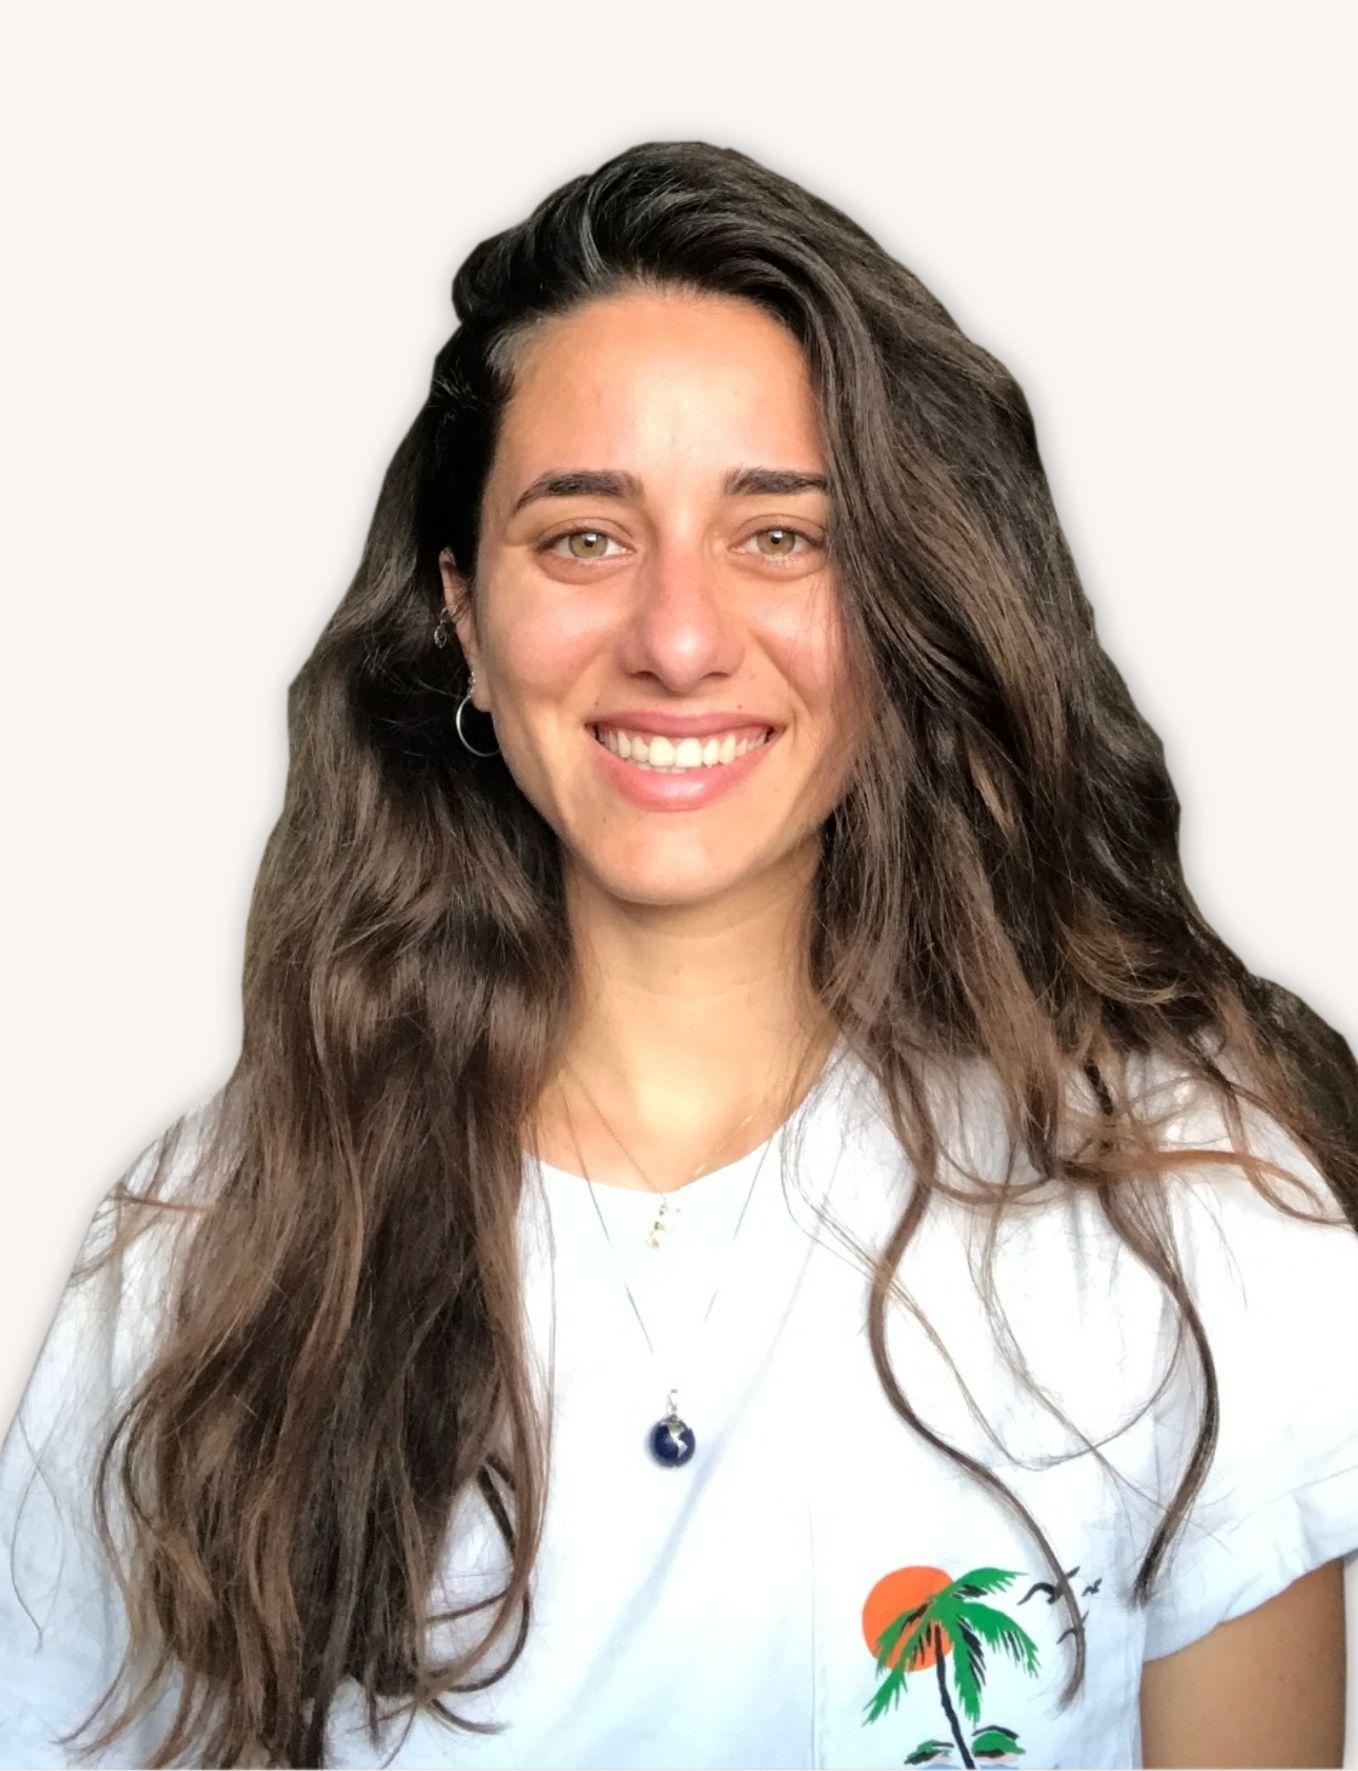 Elisa Quaranta